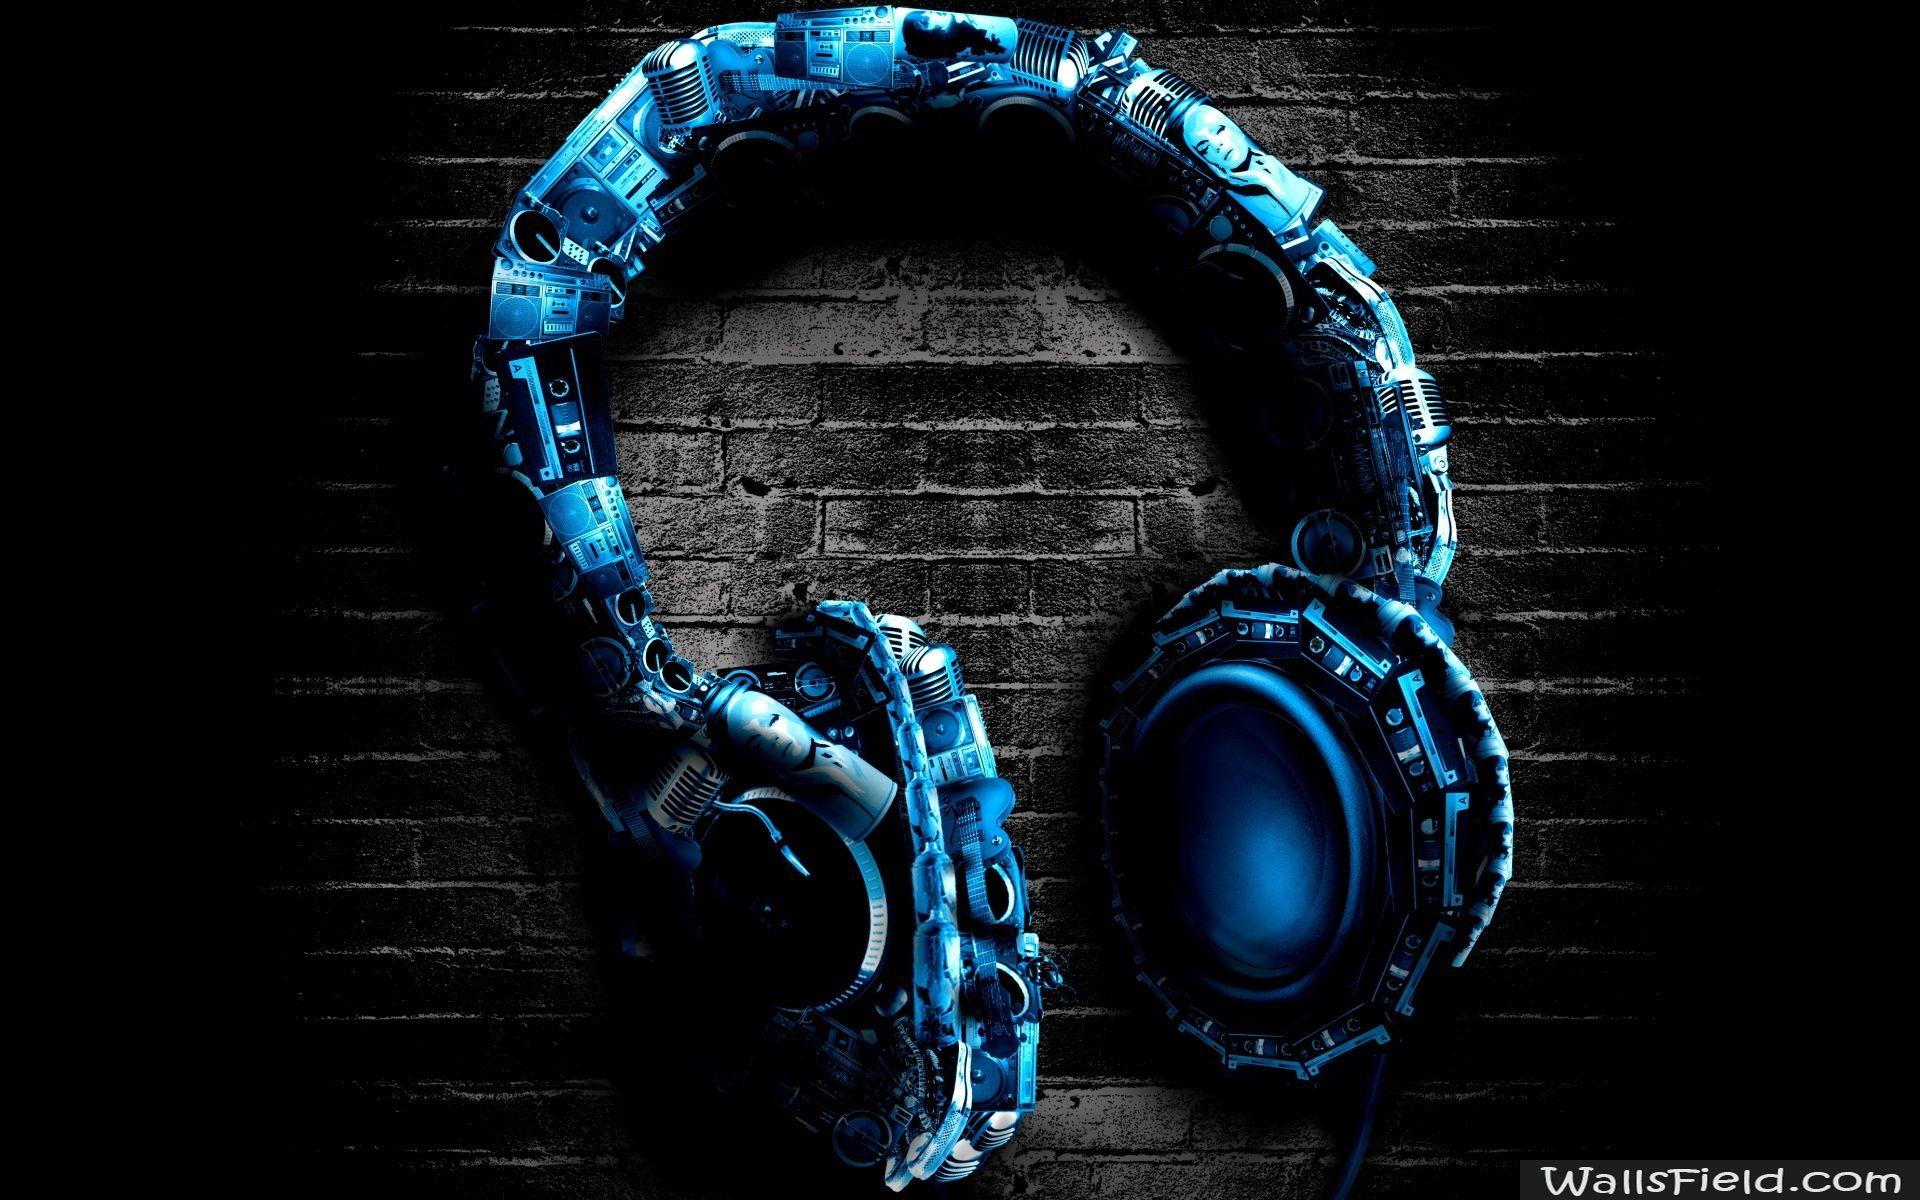 Abstract Headphones Wallsfield Com Free Hd Wallpapers Hd Wallpapers For Pc Music Wallpaper Dance Wallpaper